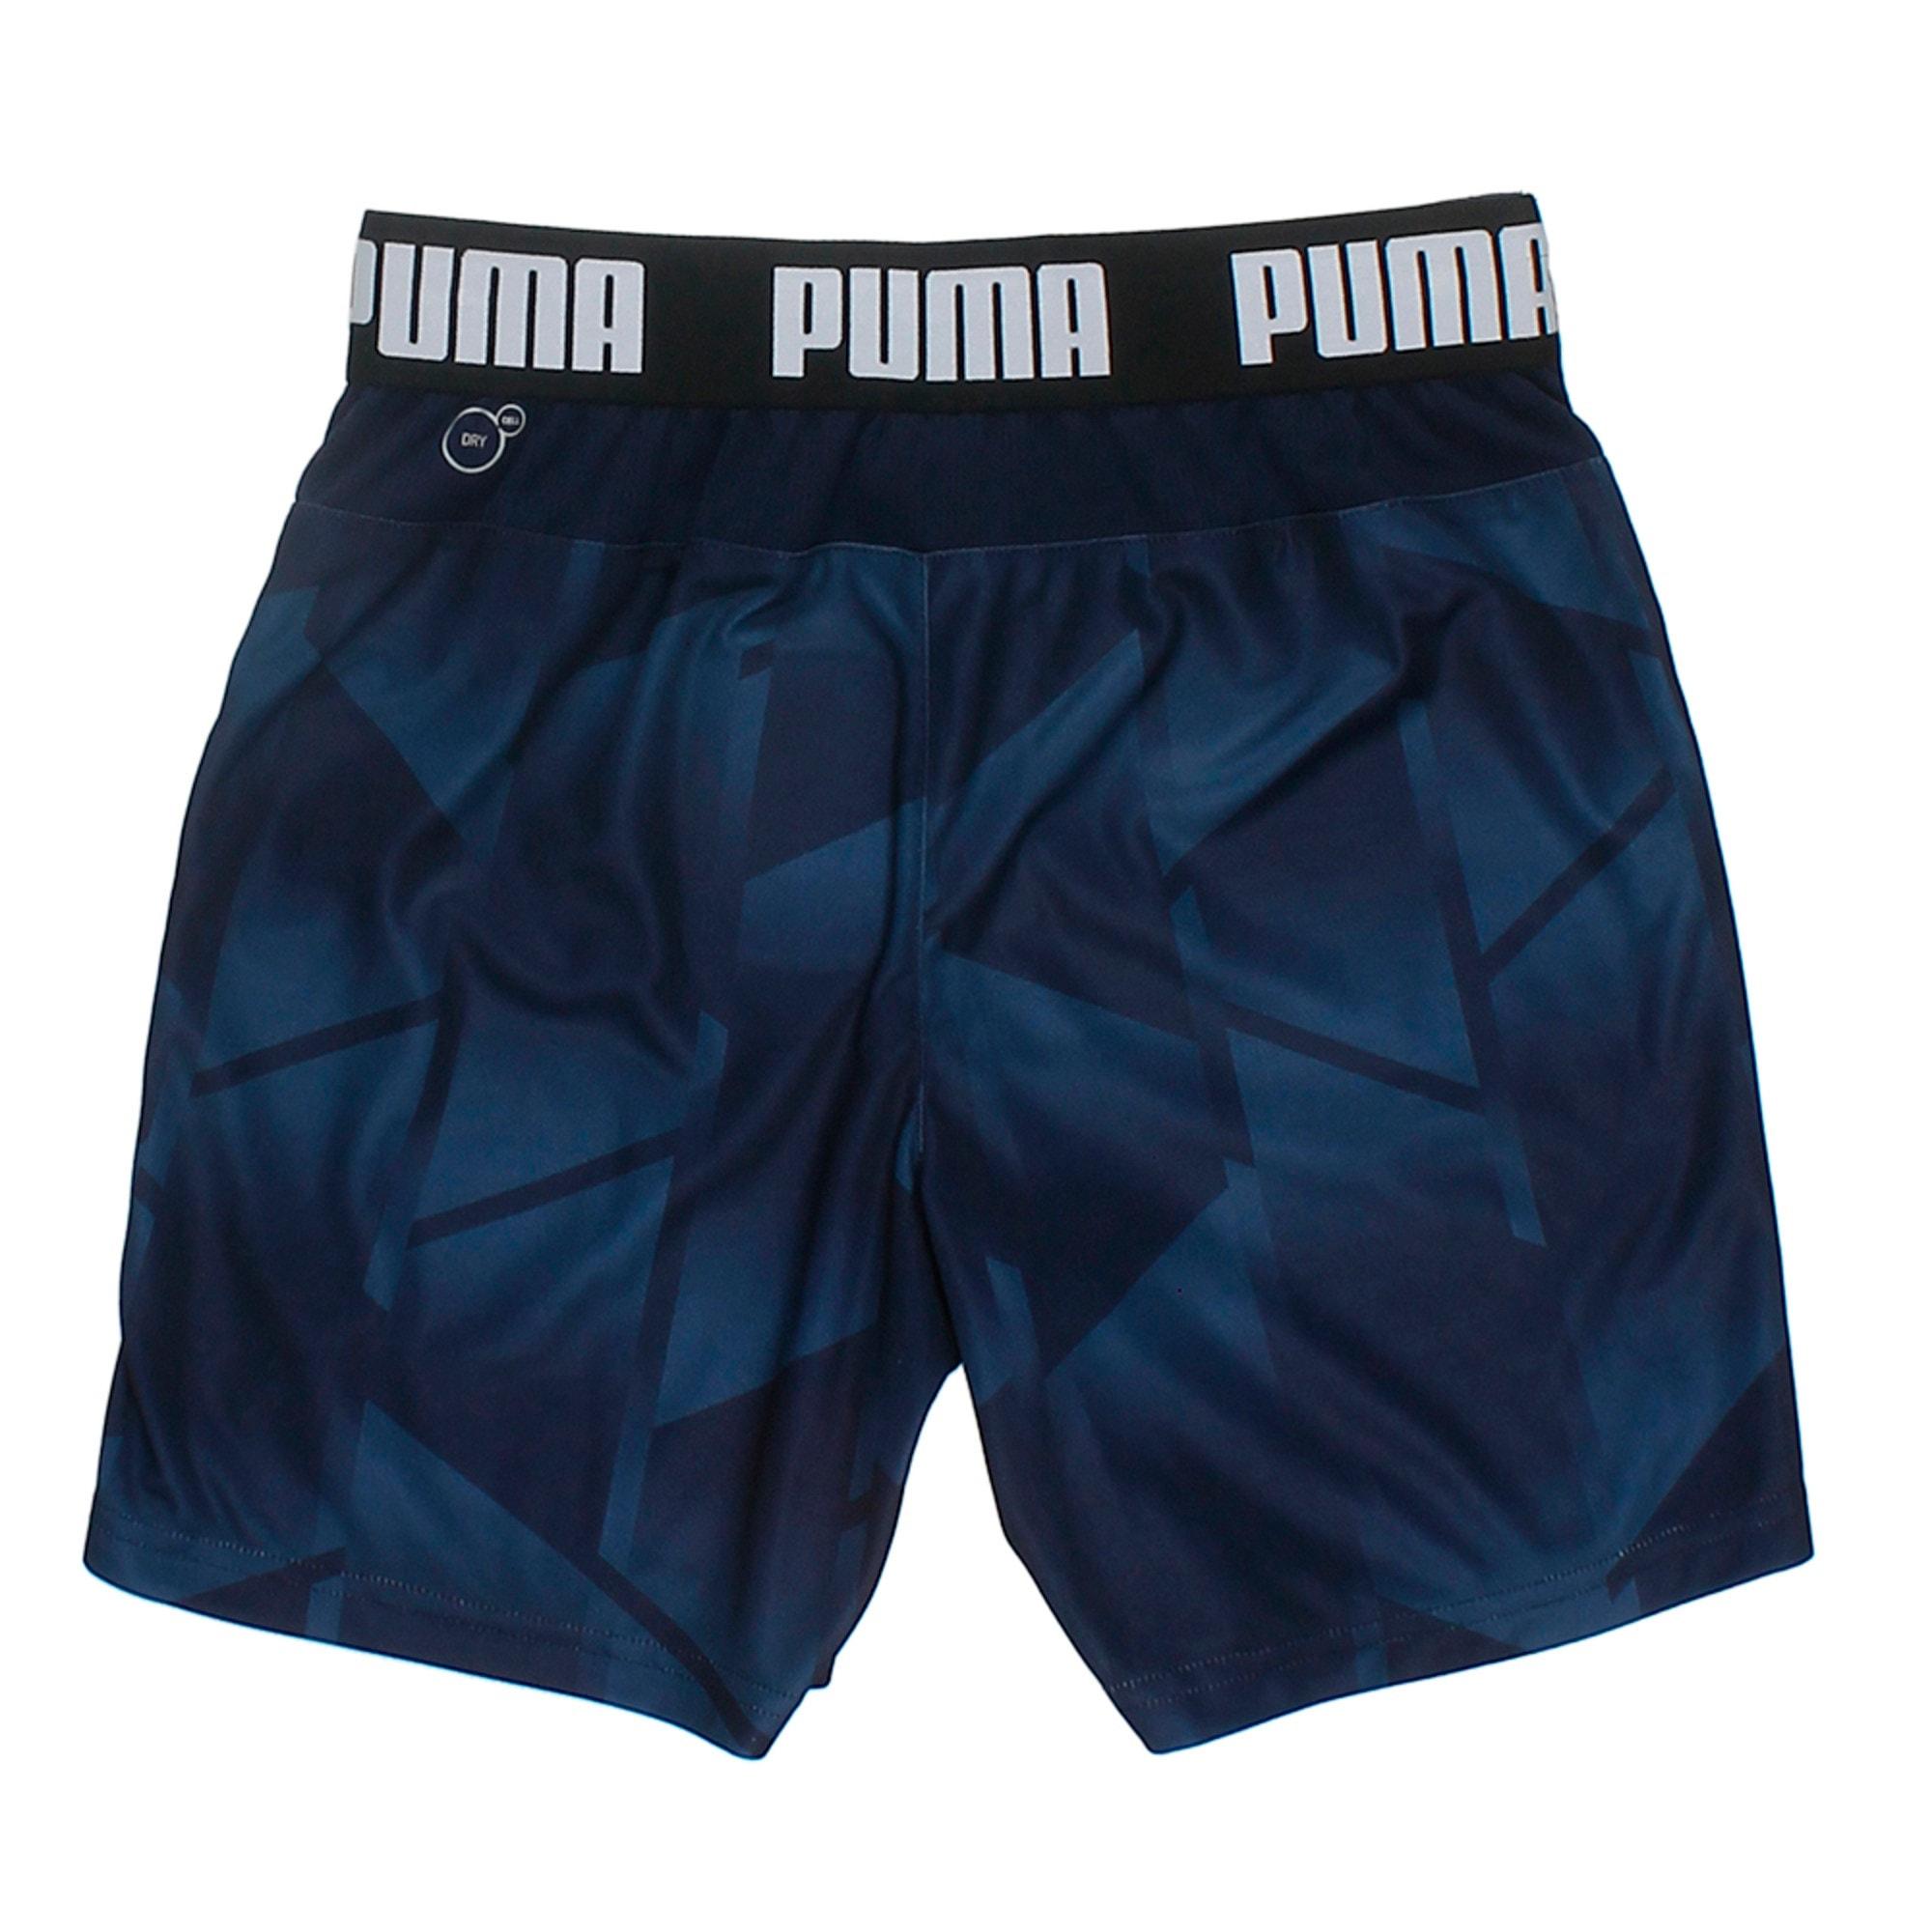 Thumbnail 3 of ftblNXT Pro Shorts Jr Puma Black, Peacoat, medium-IND